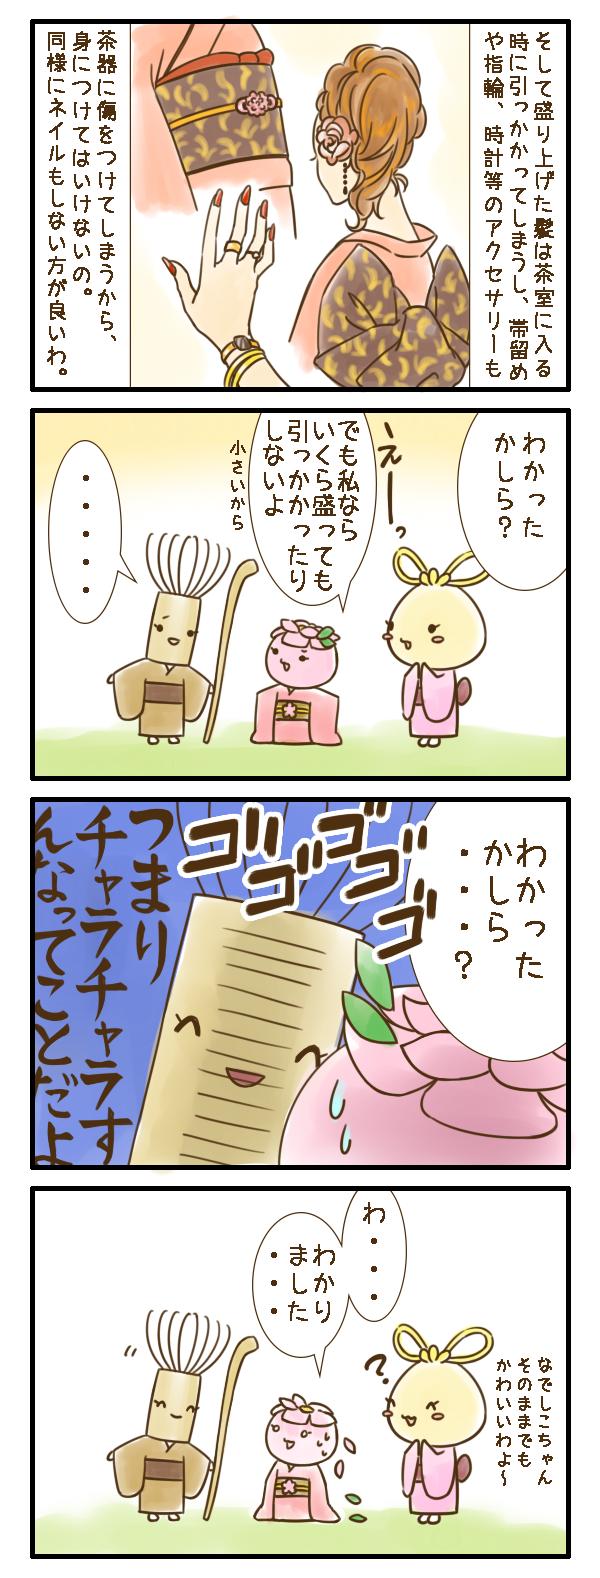 midashinami02